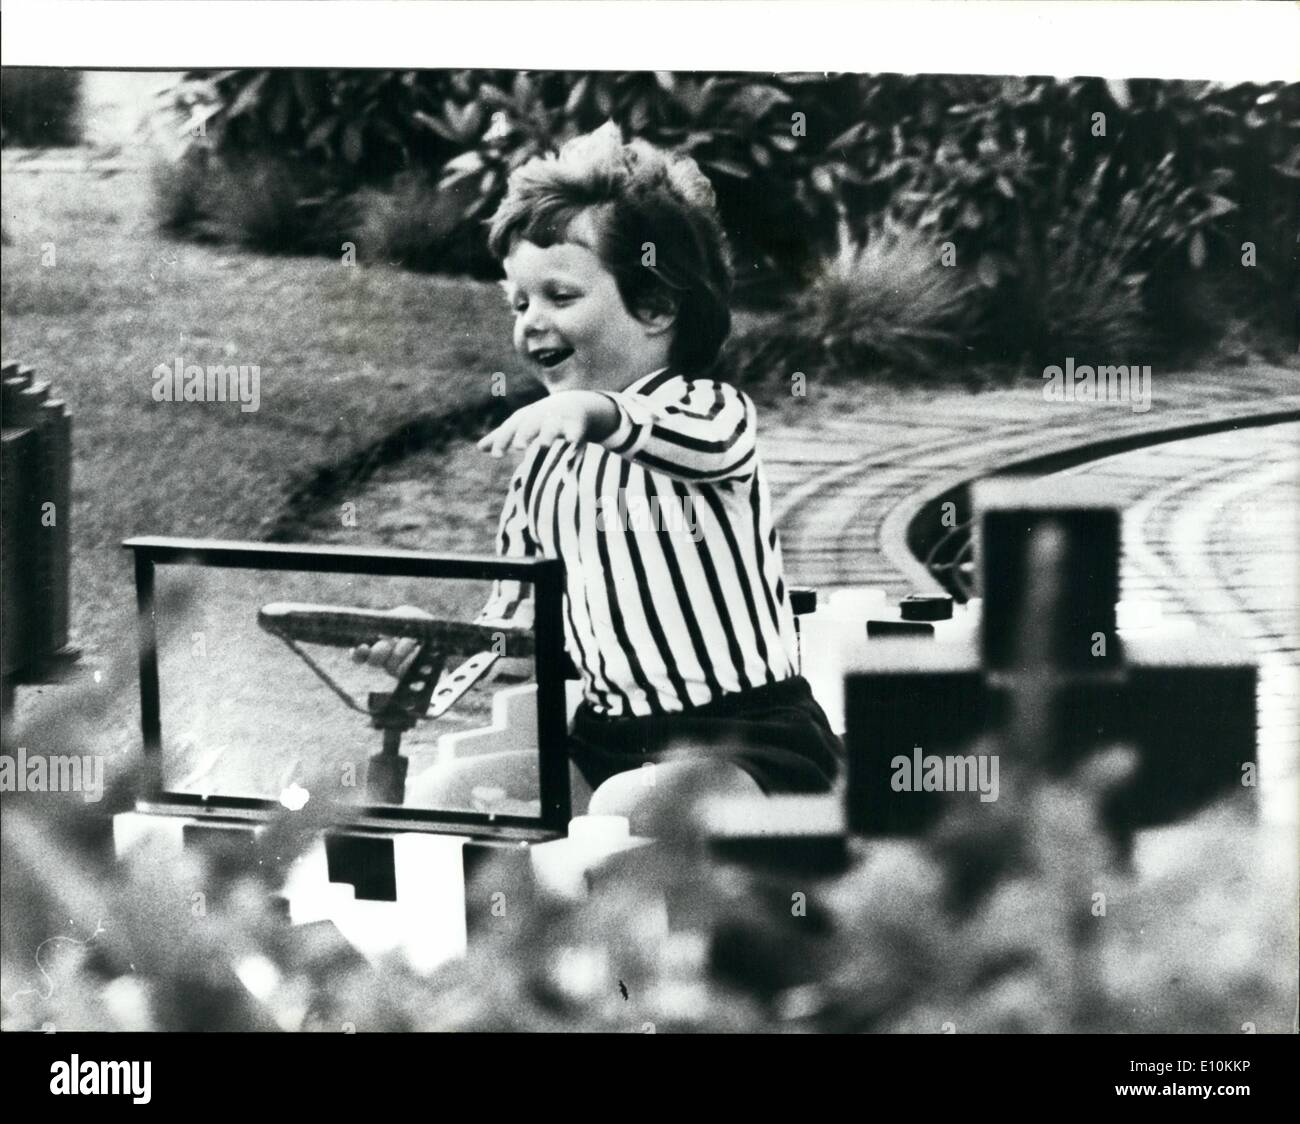 Jul. 07, 1973 - Queen Ingrid and Princess Benedikte of Denmark recently went along to the Lego - Land amusement park in Jutland - Stock Image